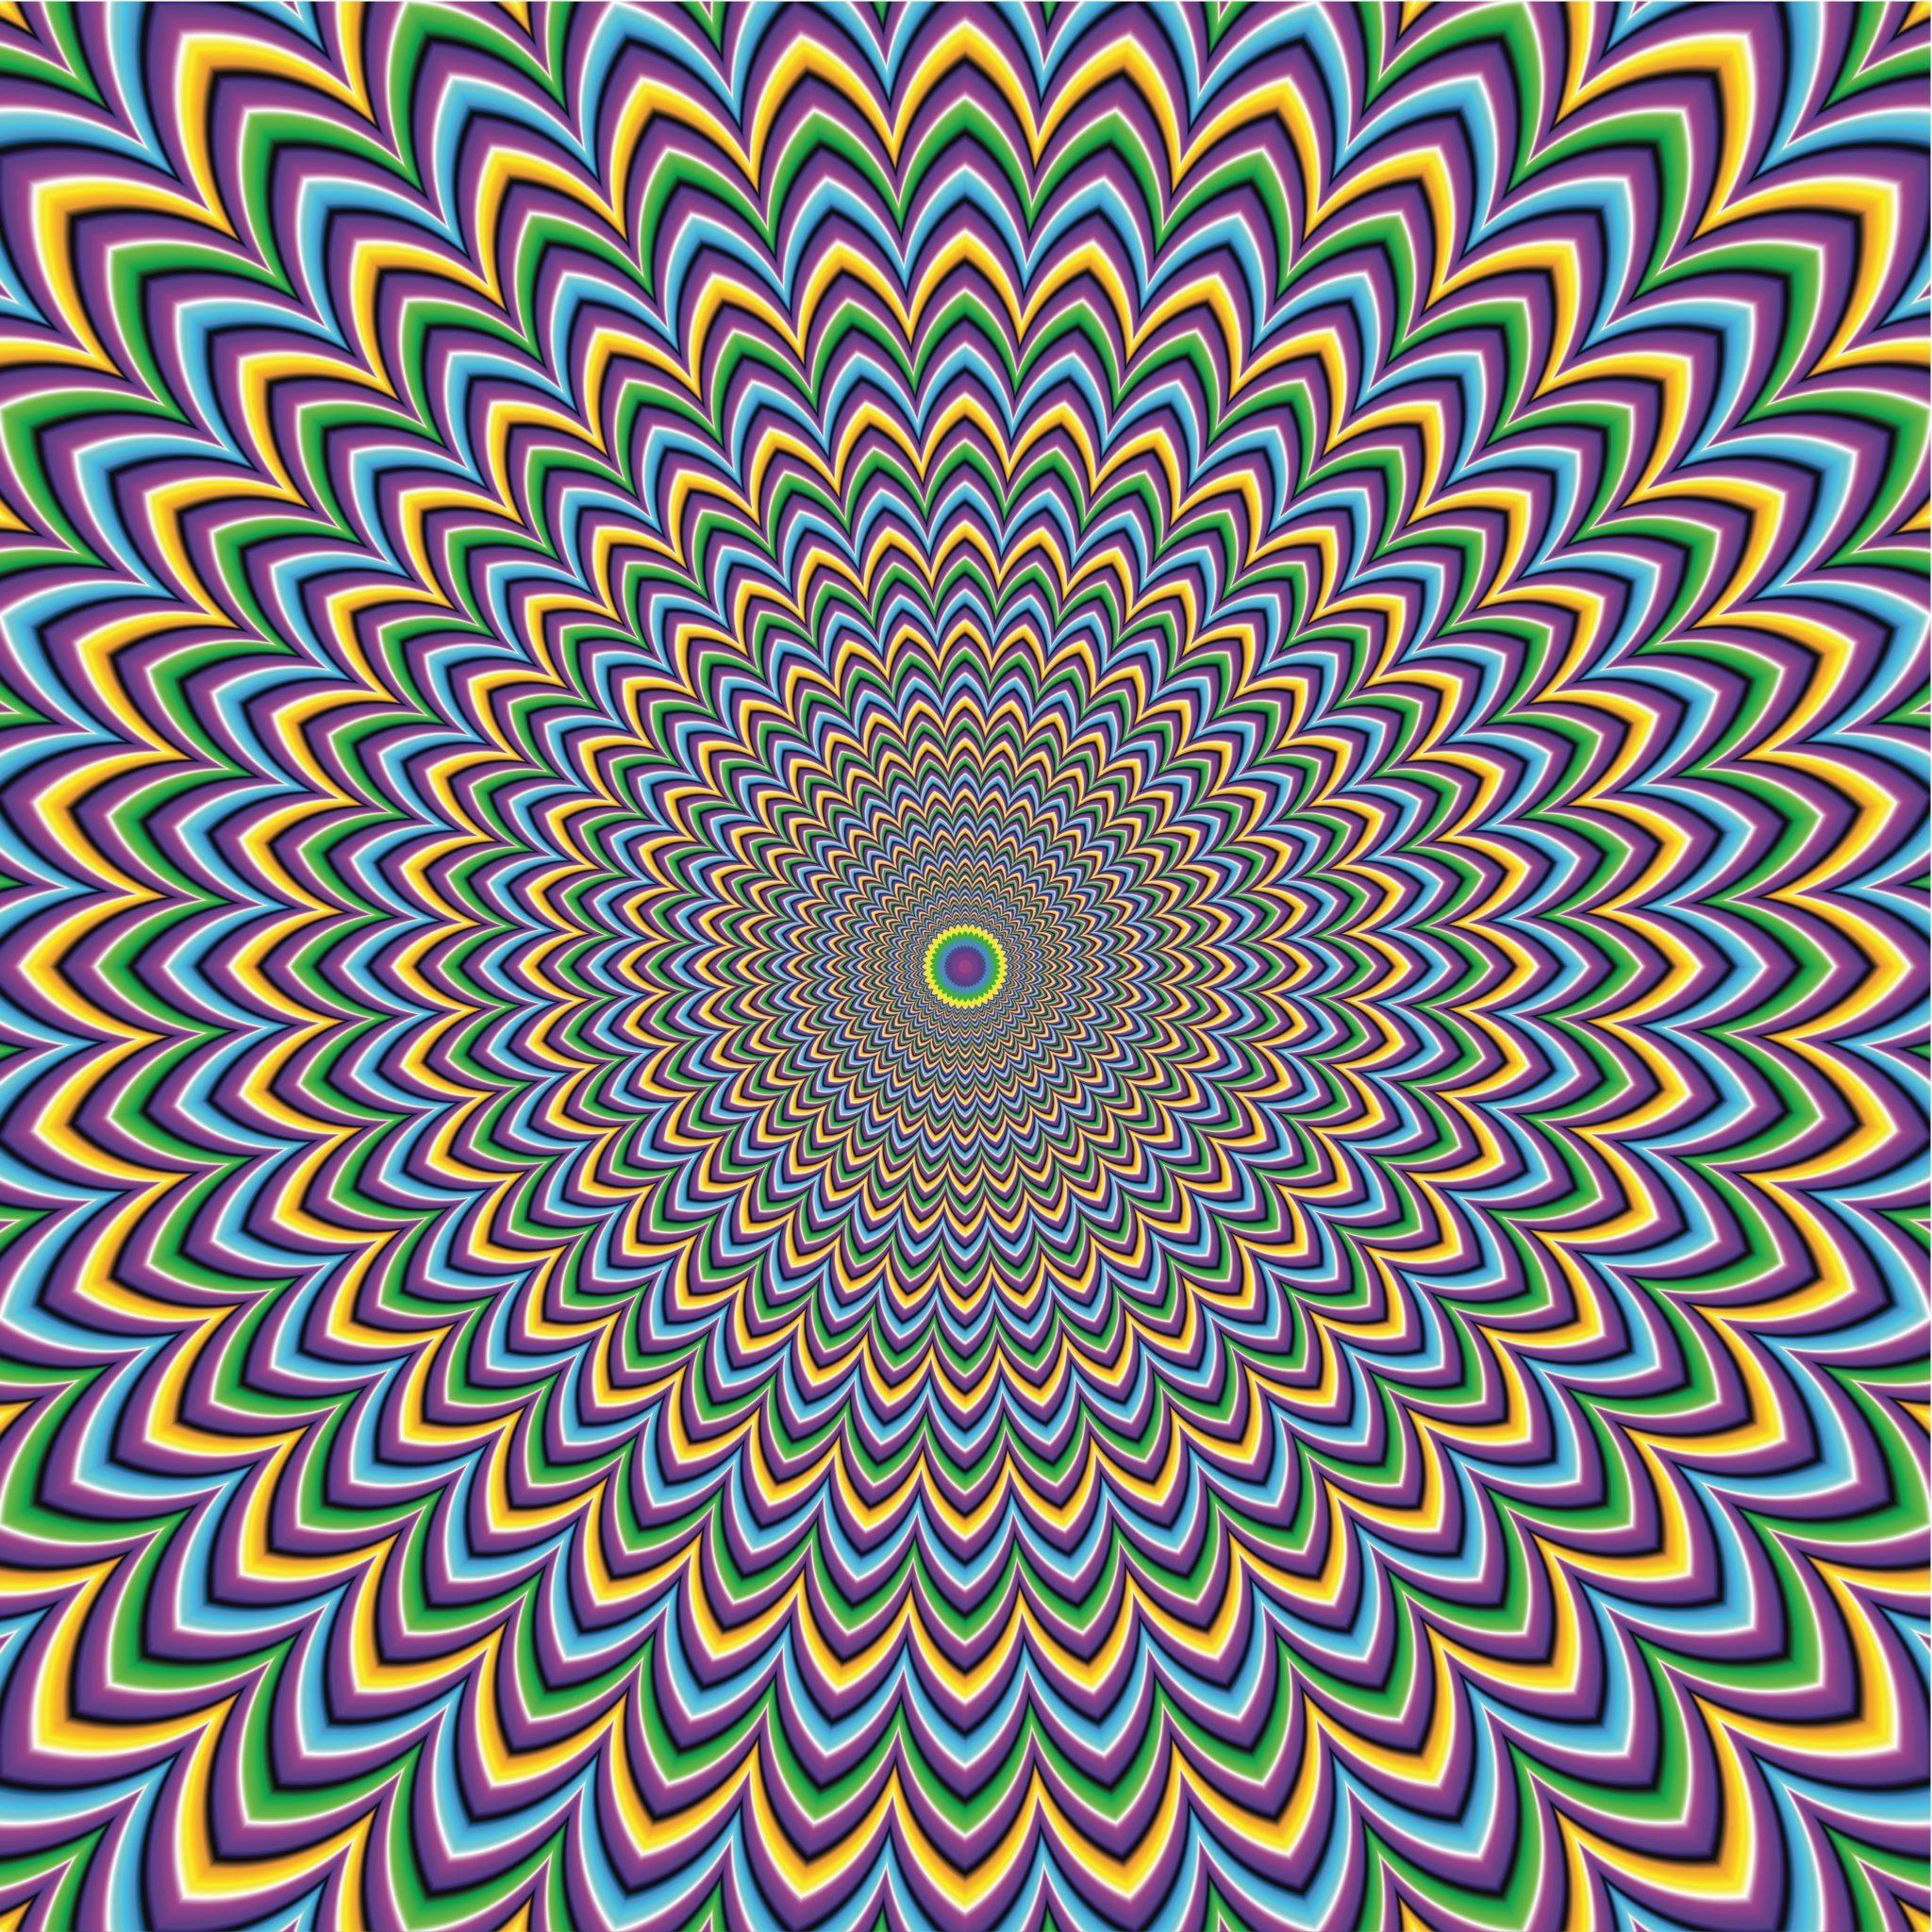 Optical Art Task